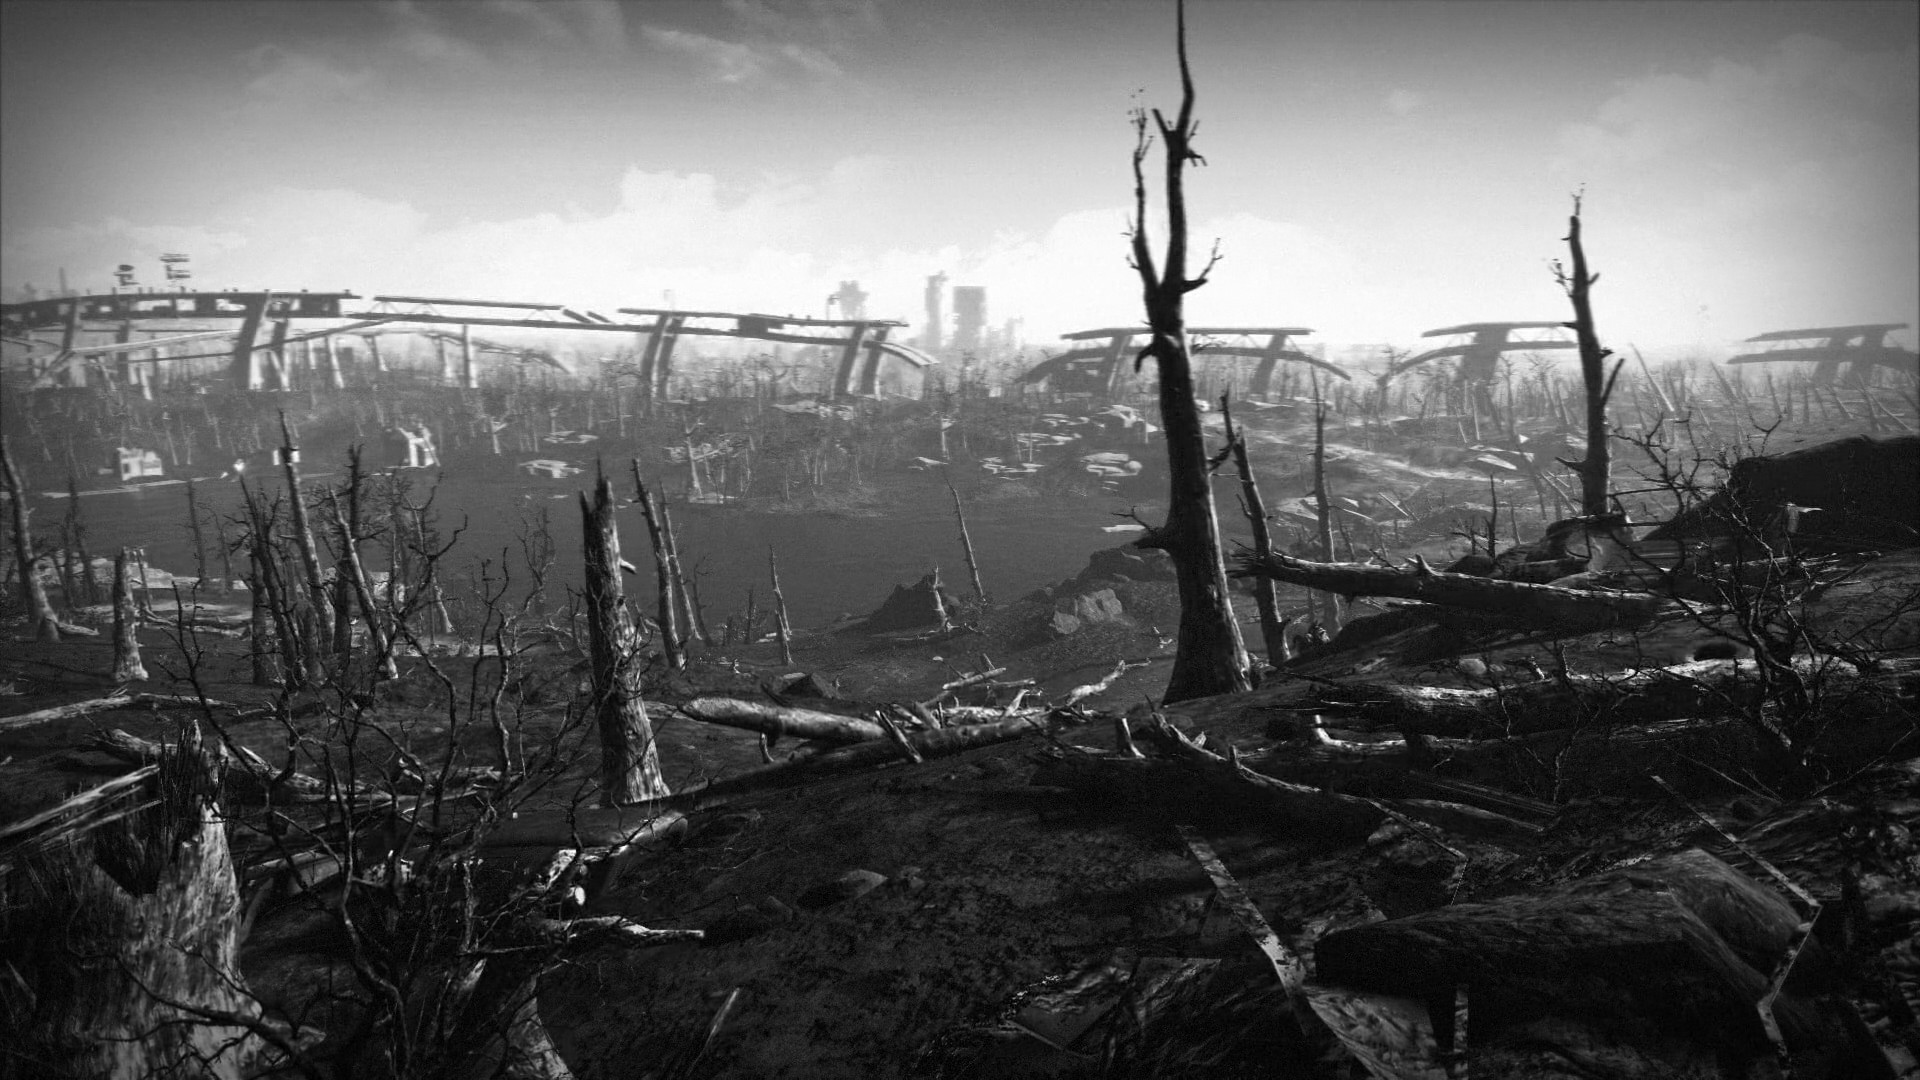 20170827210604_1.jpg - Fallout 4